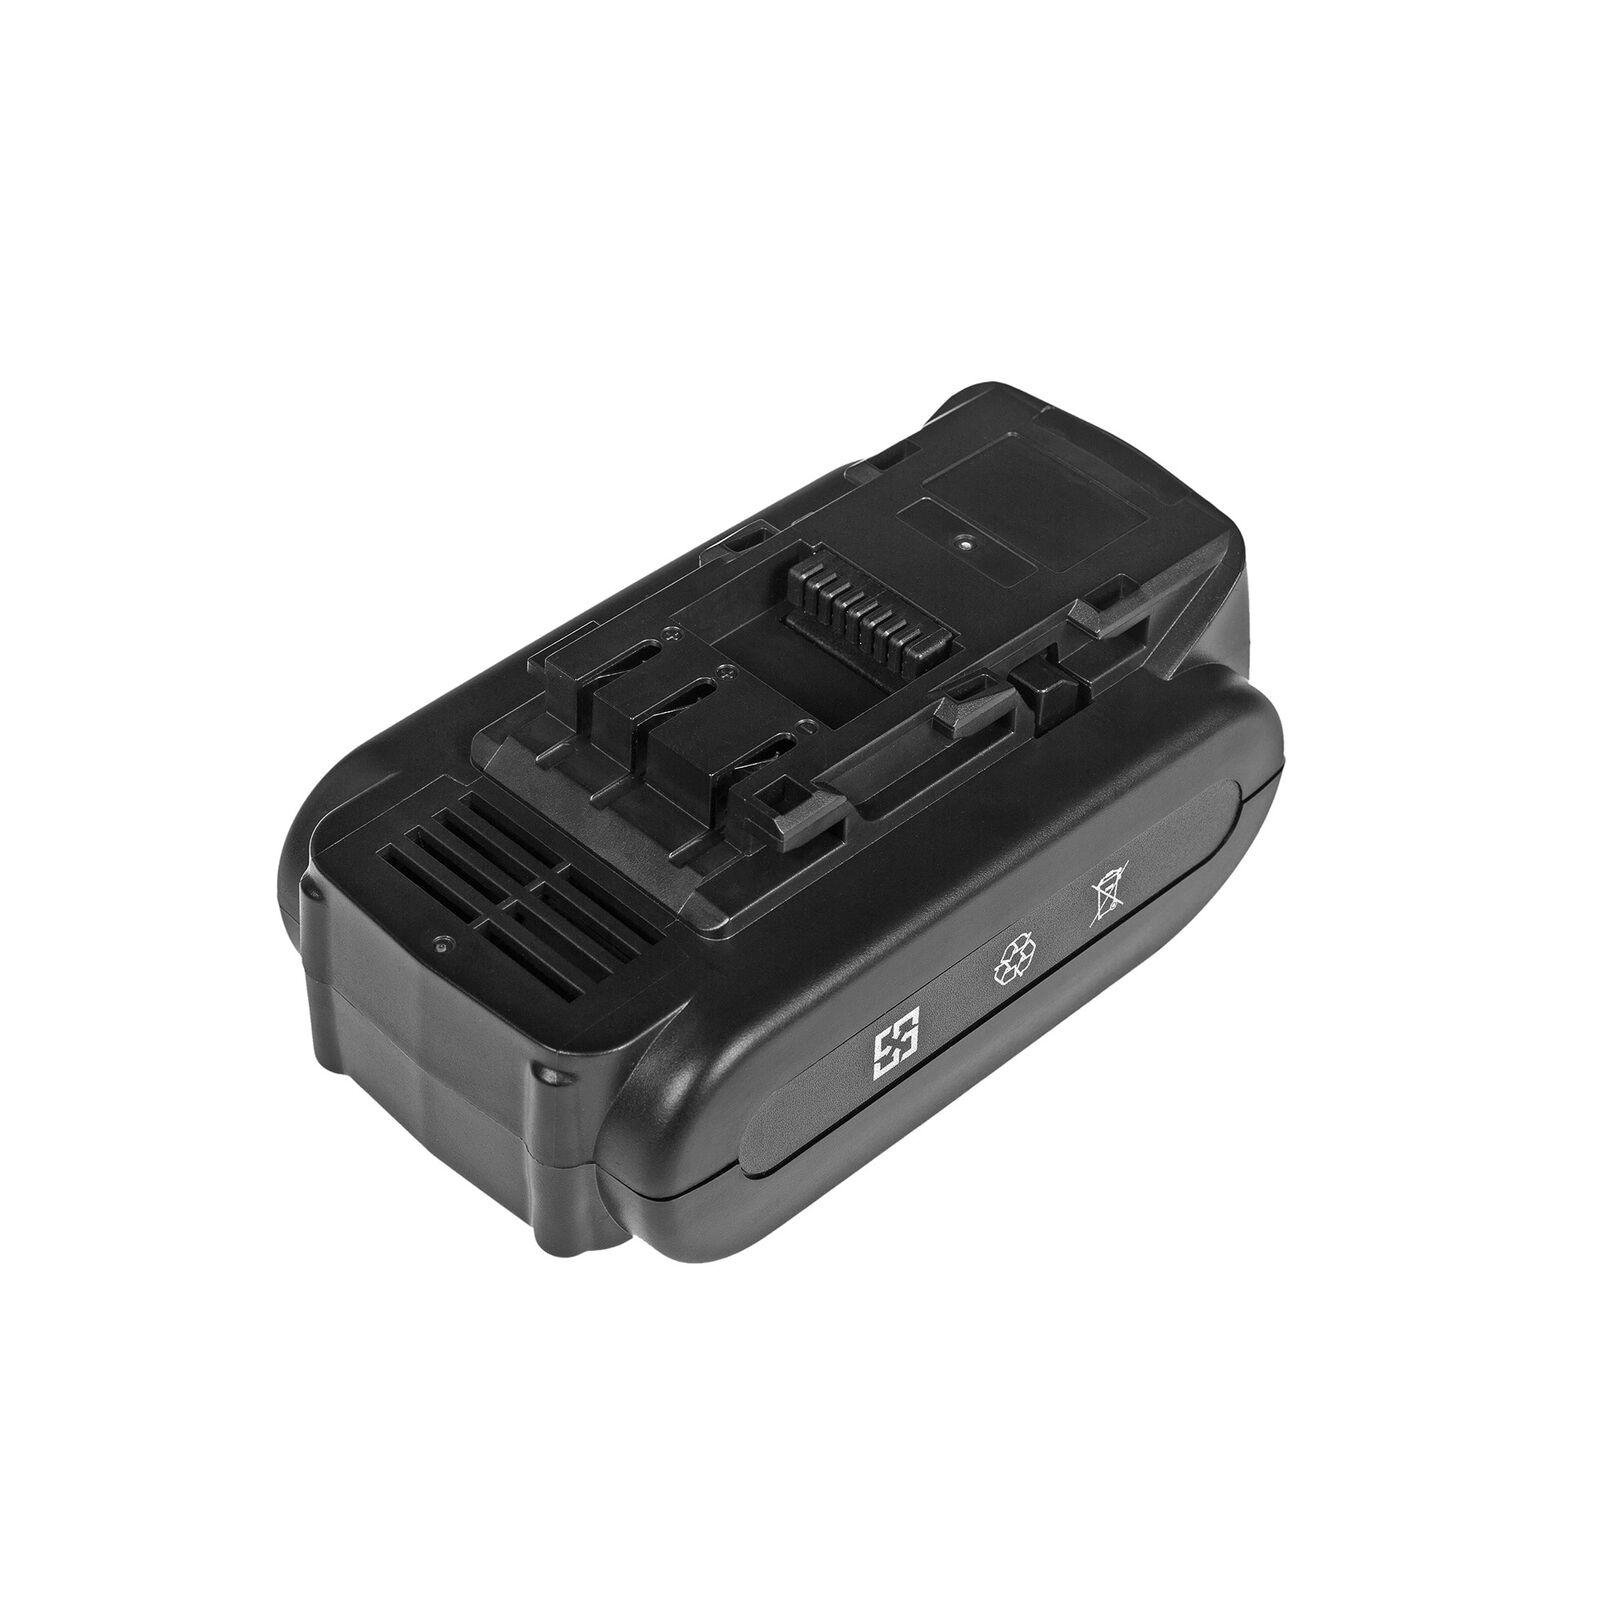 14.4V Li-Ion 5.0AH Panasonic EY3640 EY3641 EY3740 EY3741 EY4541 (kompatibelt batteri)